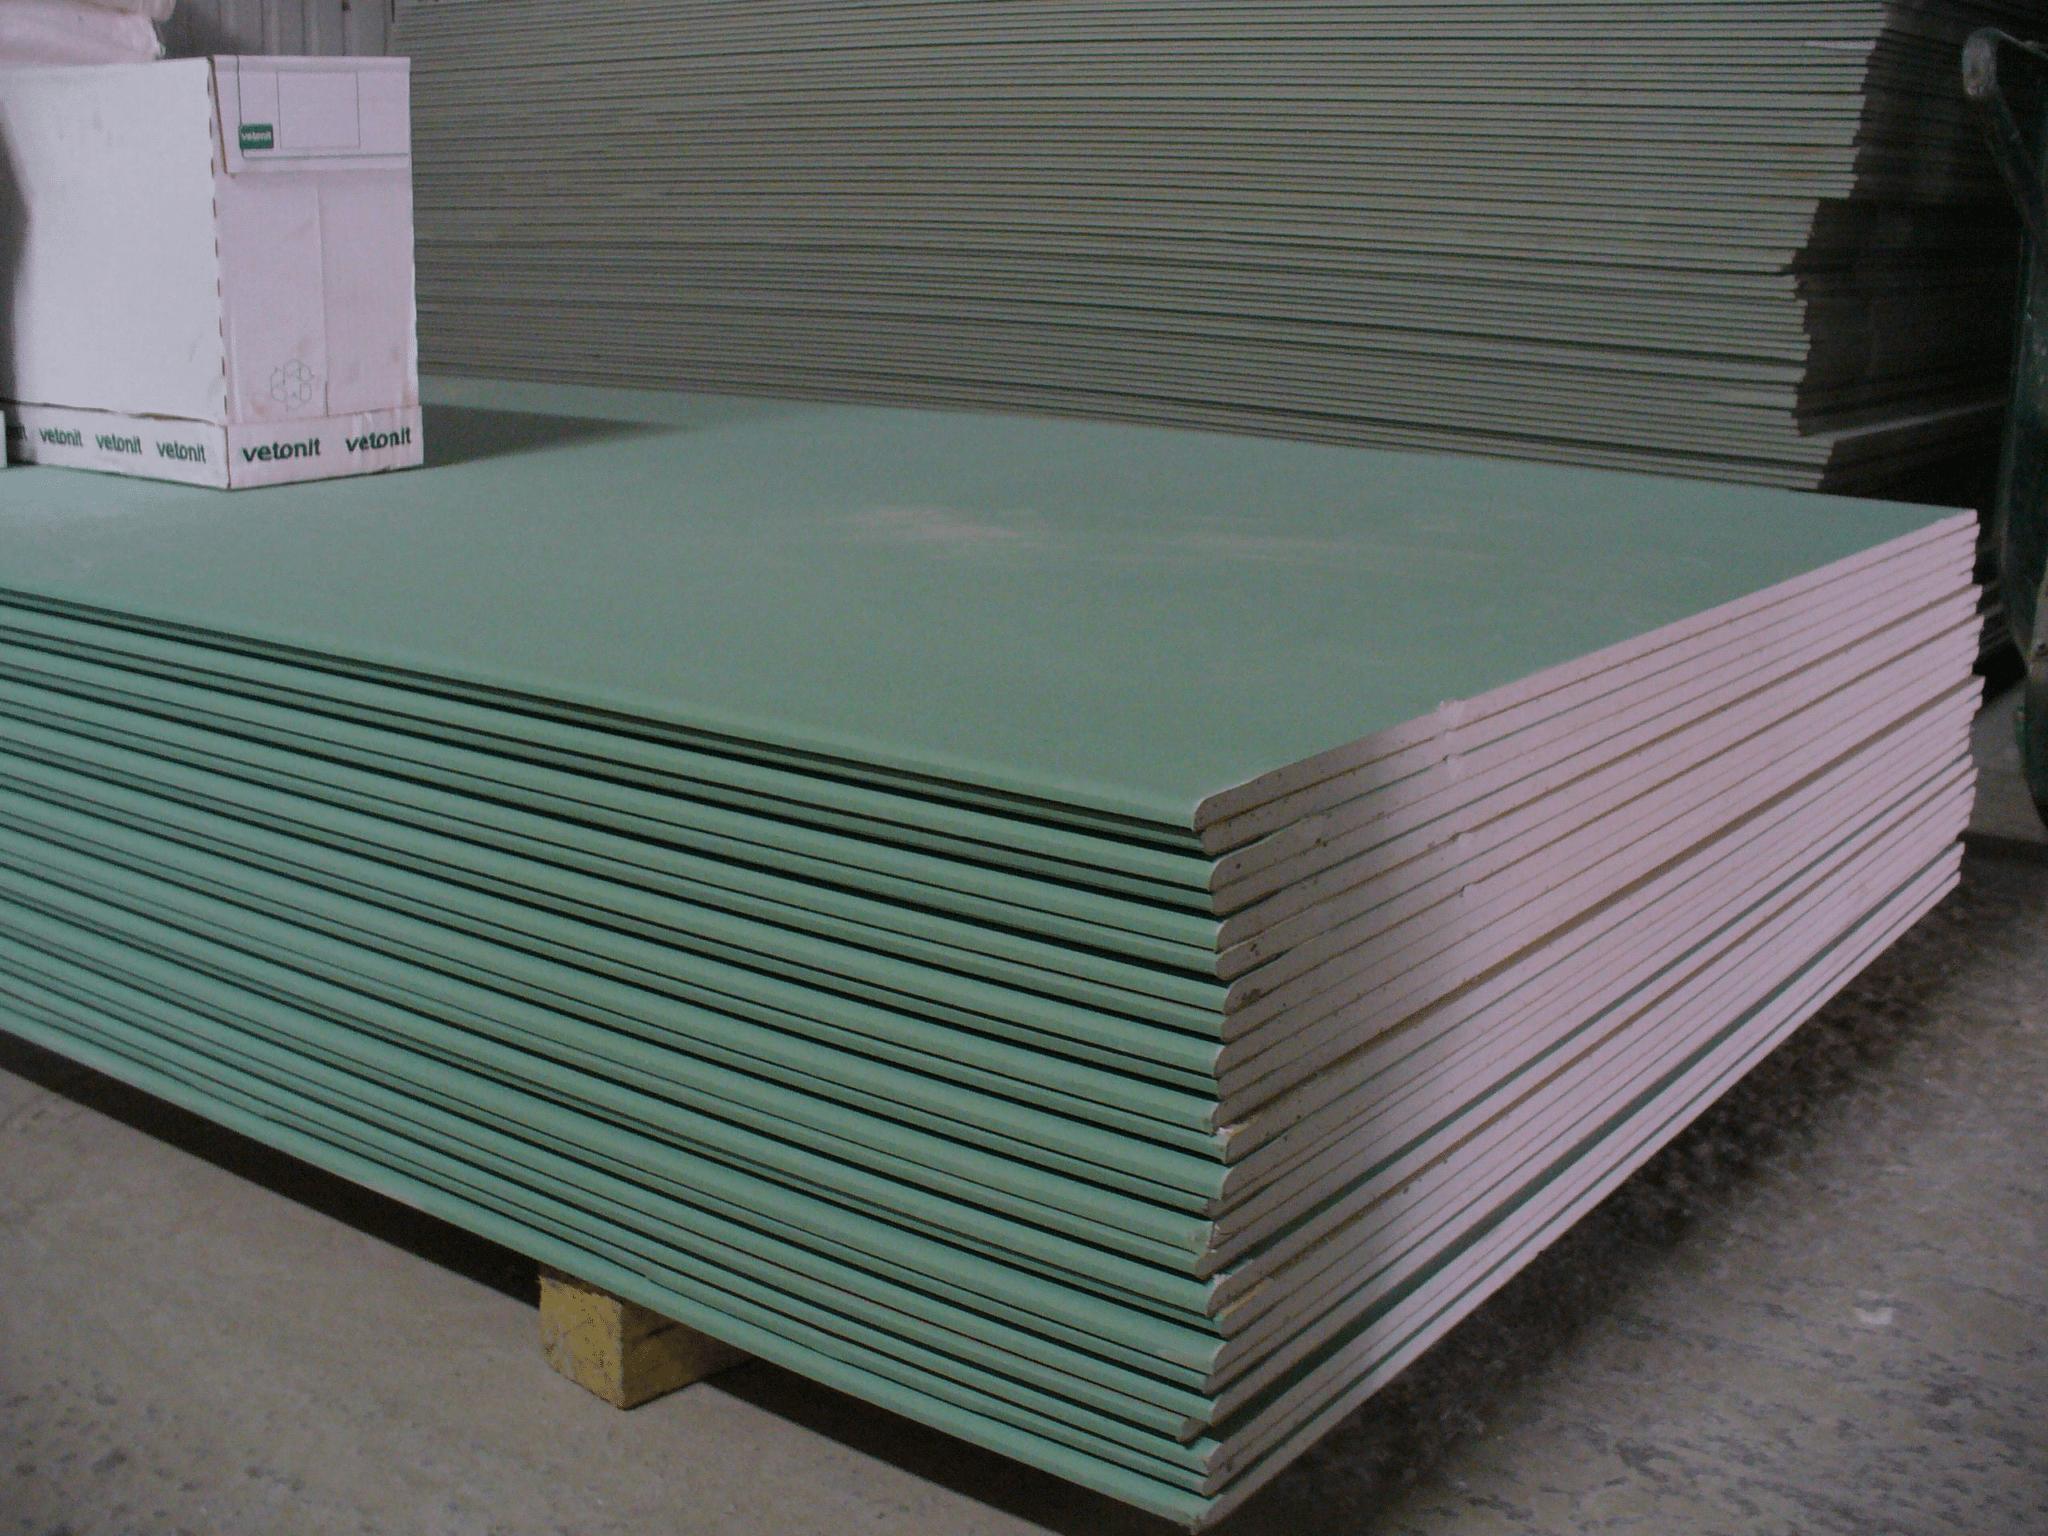 схема обшивки потолка гипсокартоном